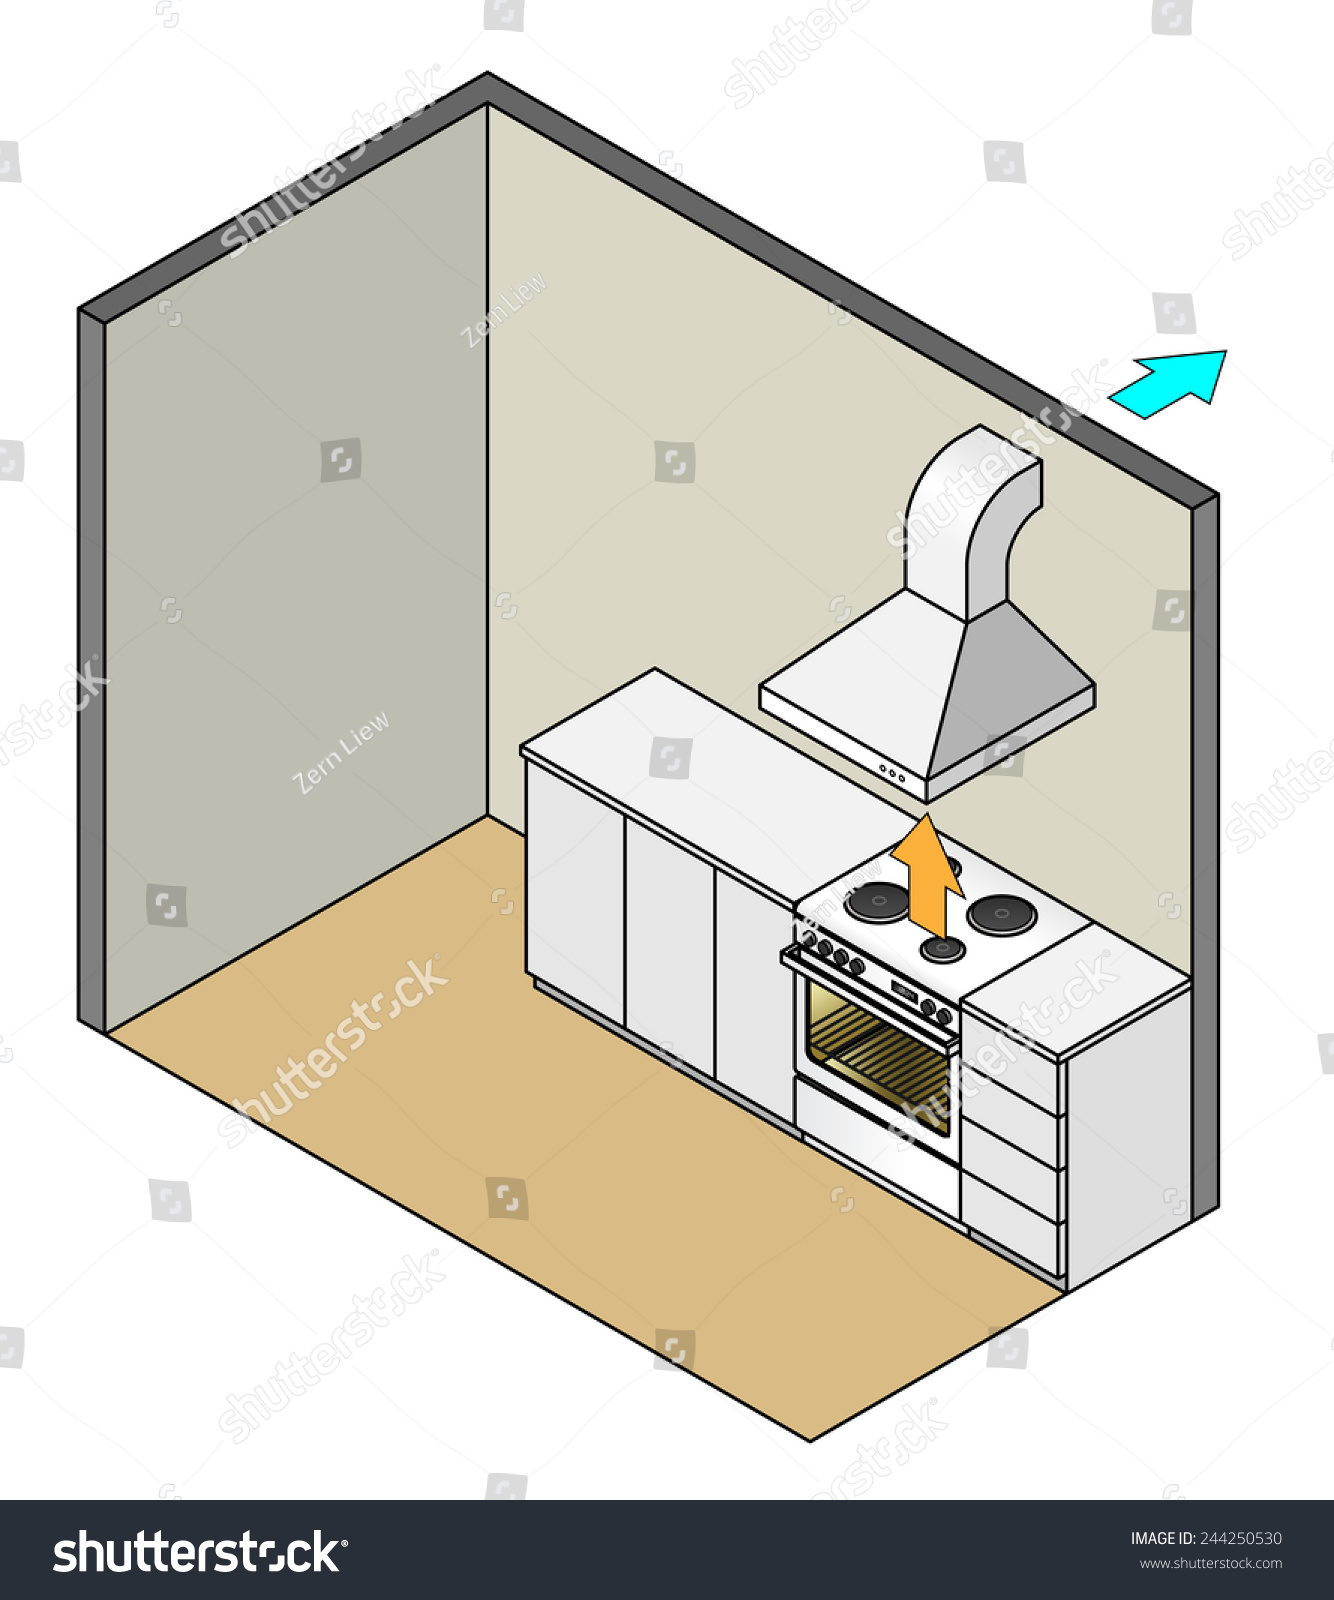 Range Hood Installation In A Kitchen. Arrows Show Air Circulation. Exhaust  Through Wall.